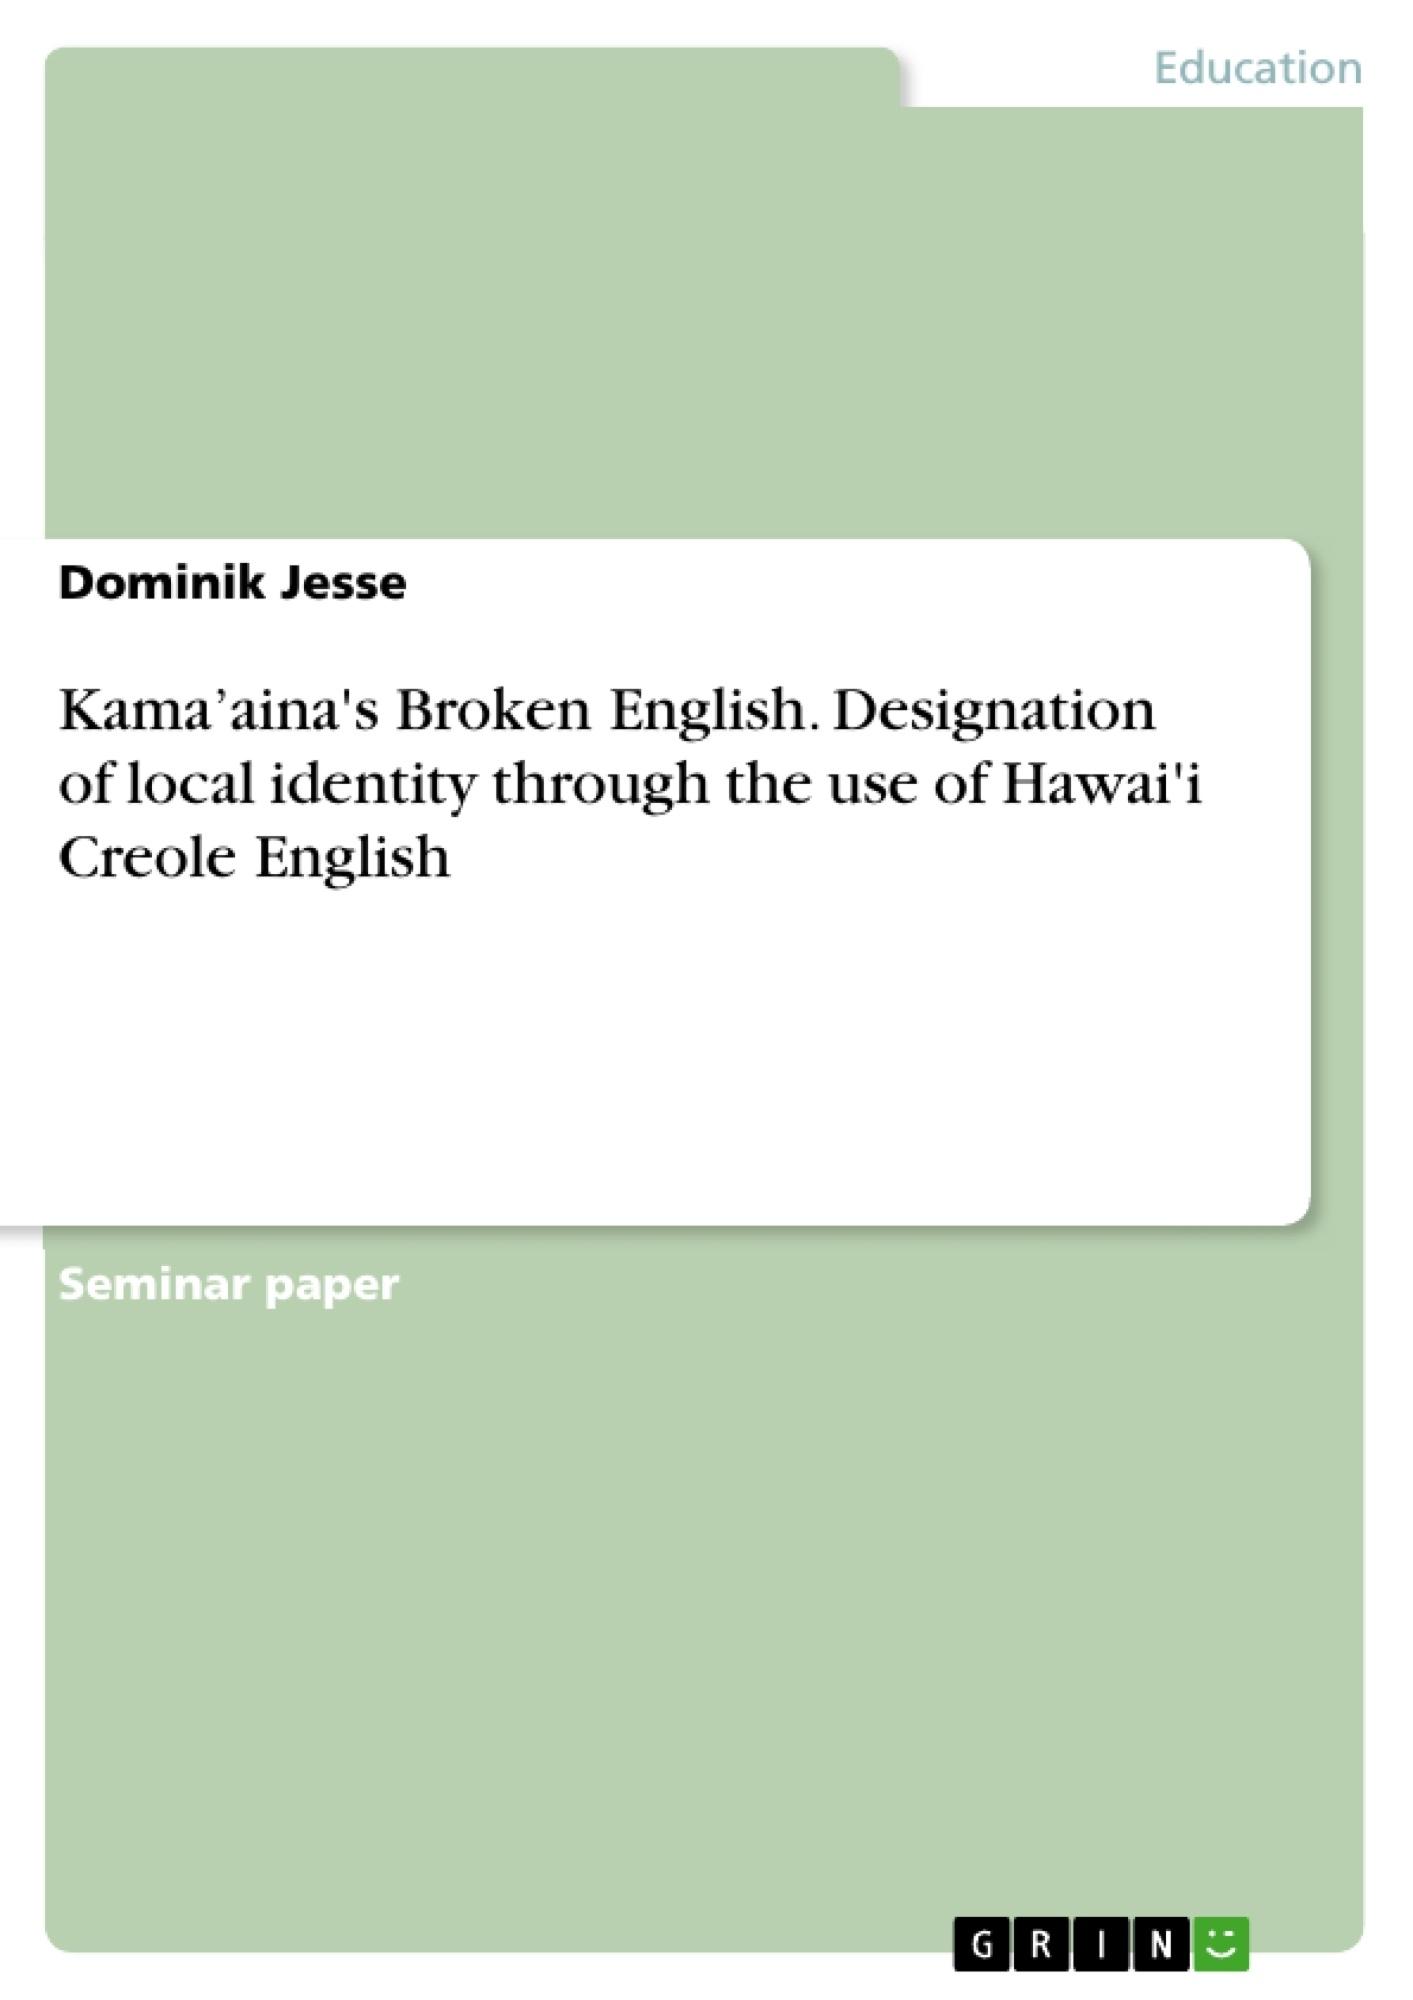 Title: Kama'aina's Broken English. Designation of local identity through the use of Hawai'i Creole English